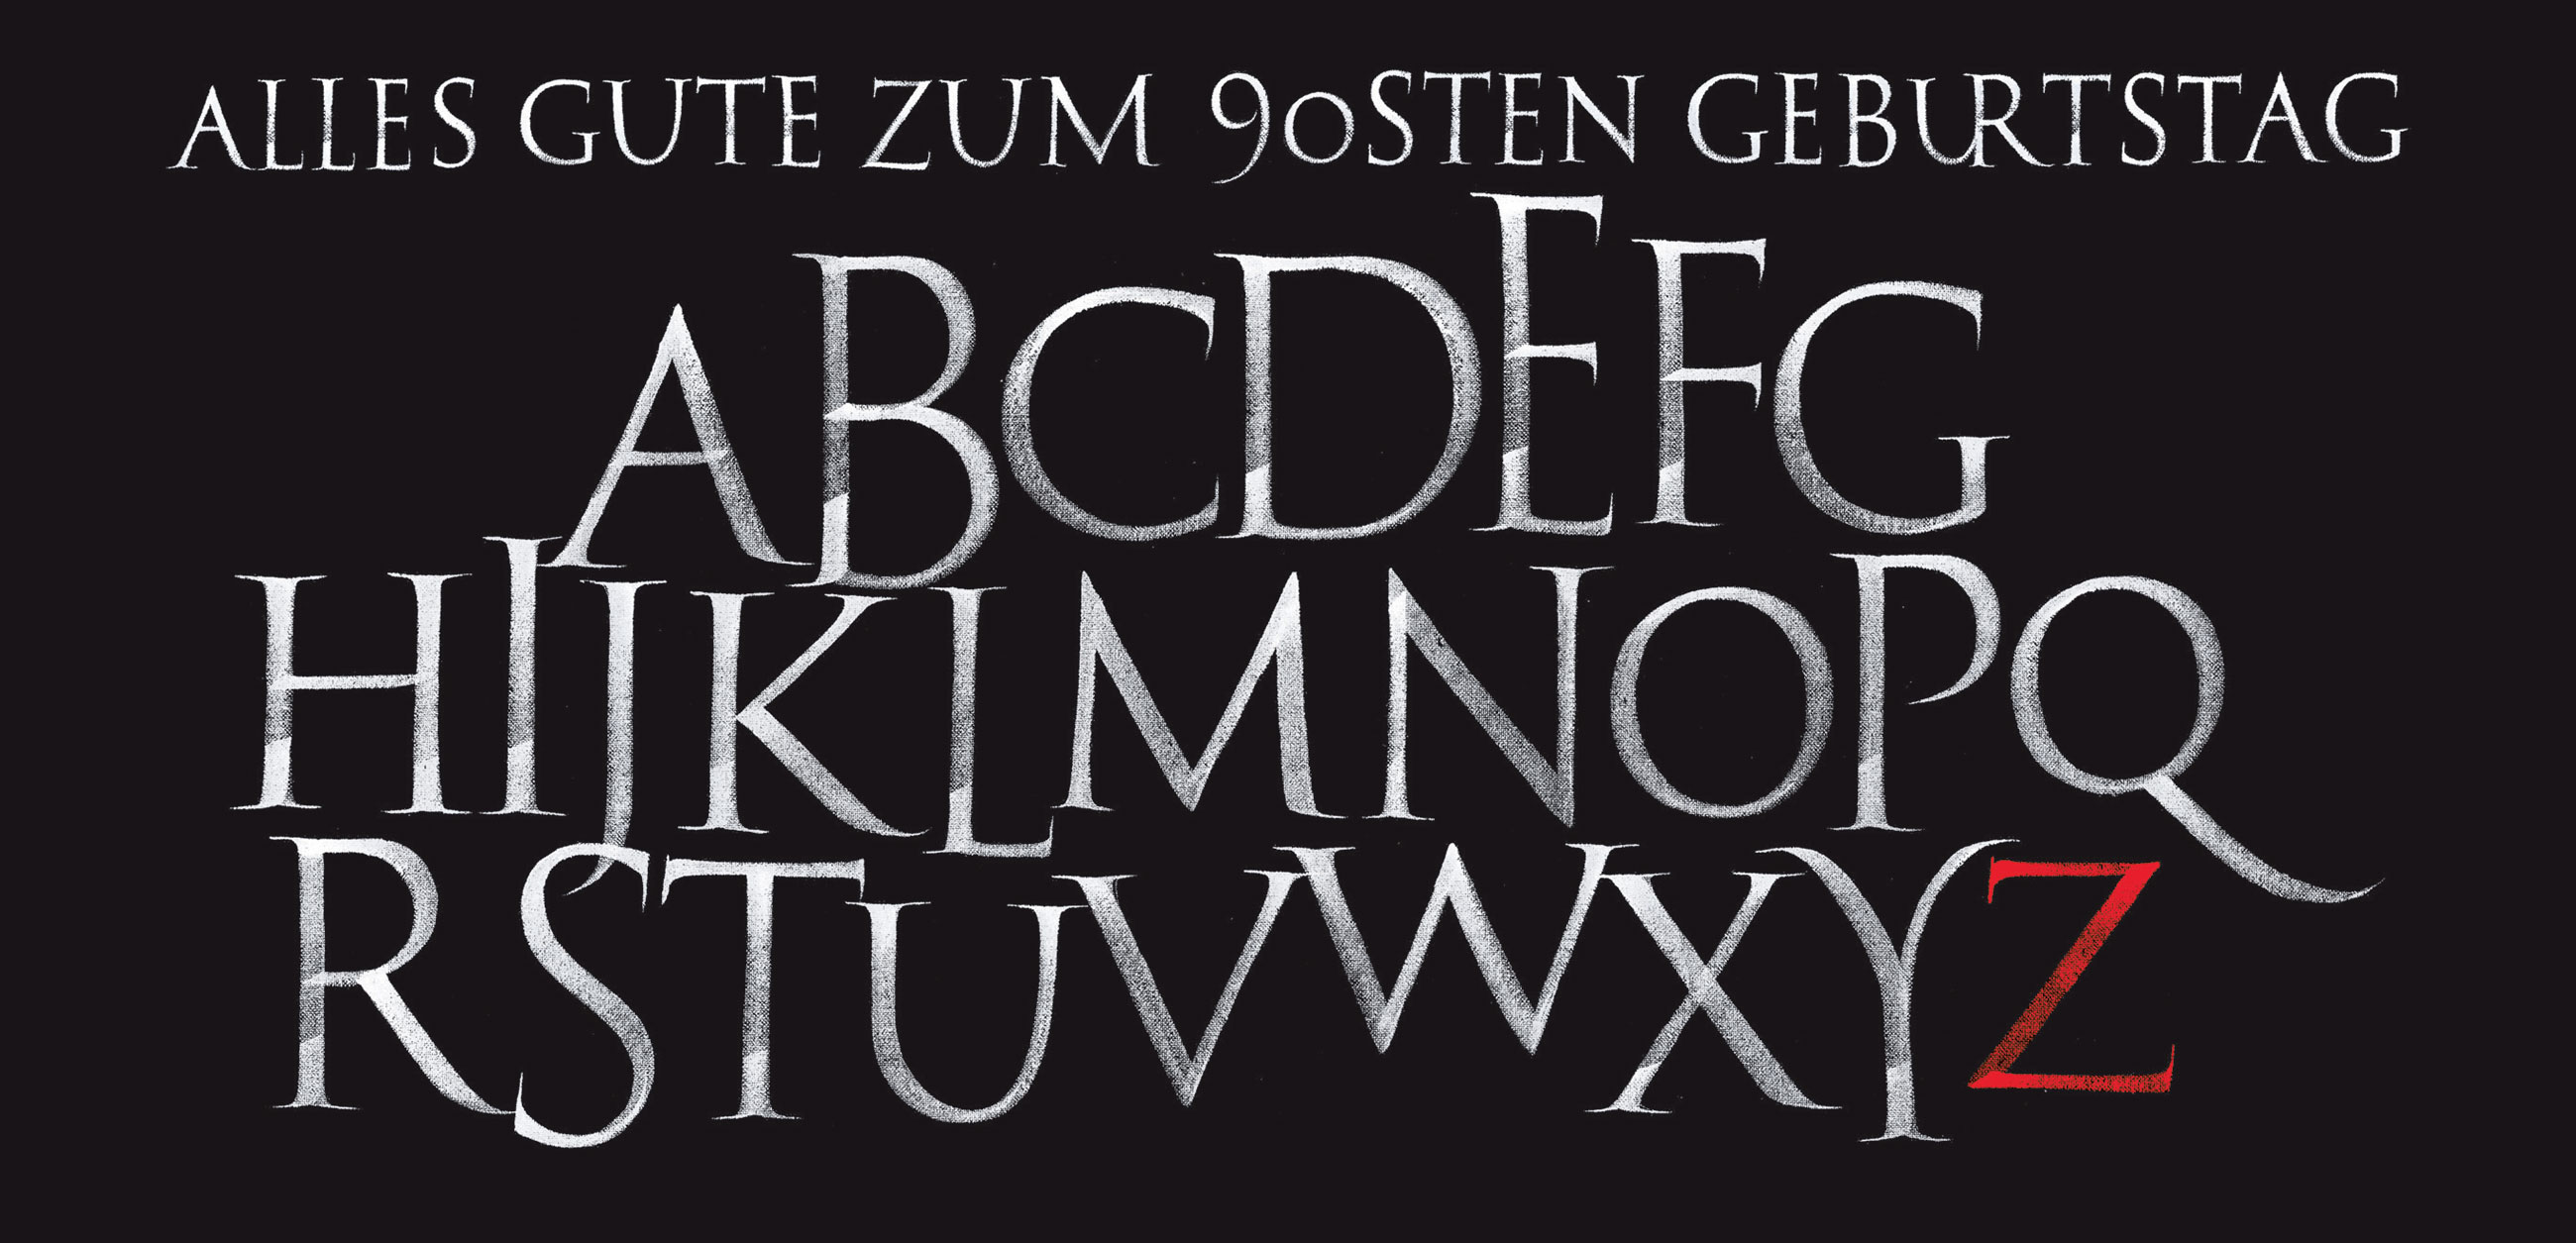 Hermann-Zapf-calligraphie-01